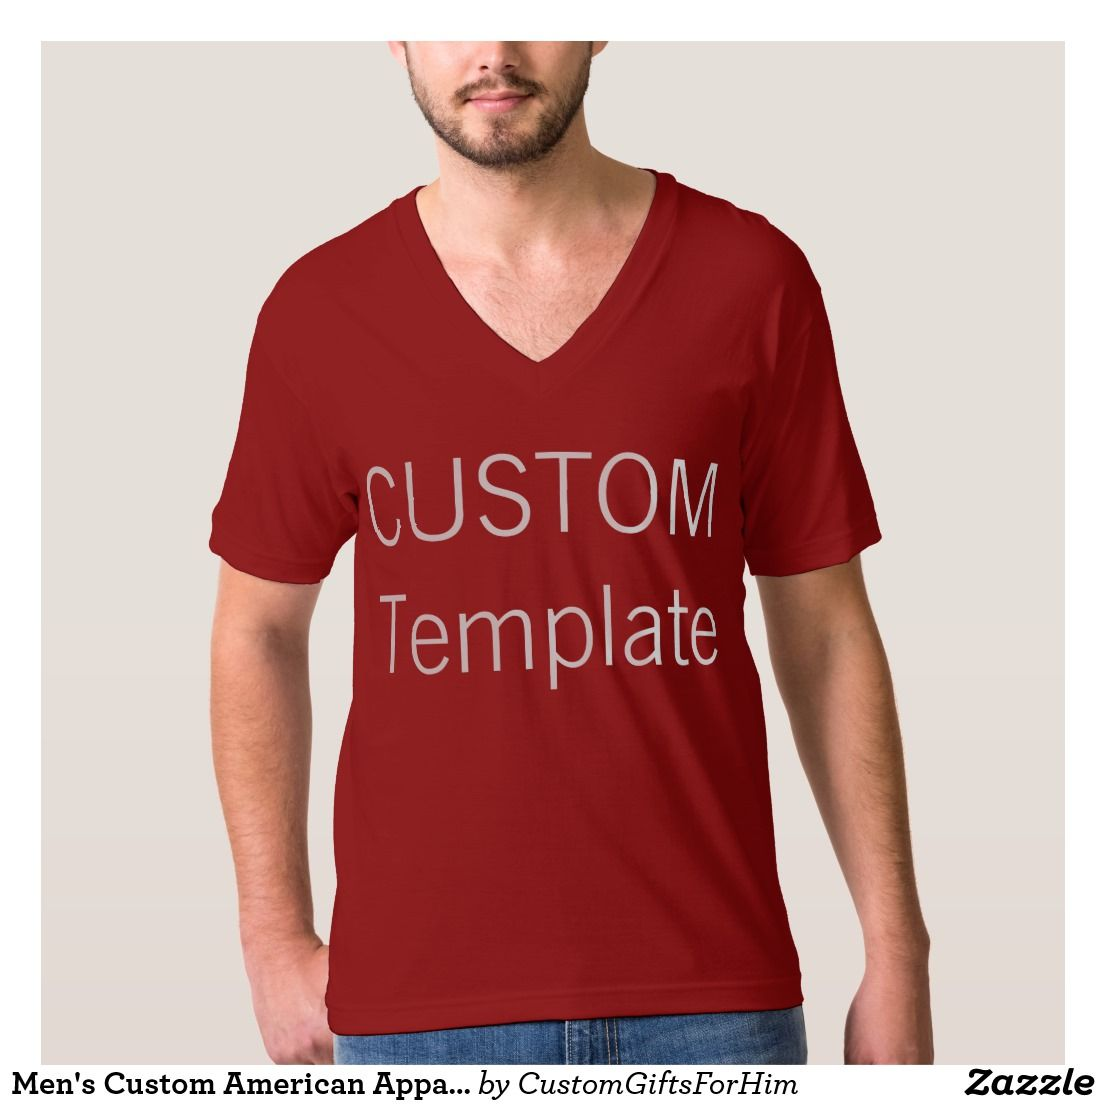 Zazzle t shirt design template - Men S Custom American Apparel V Neck T Shirt Red